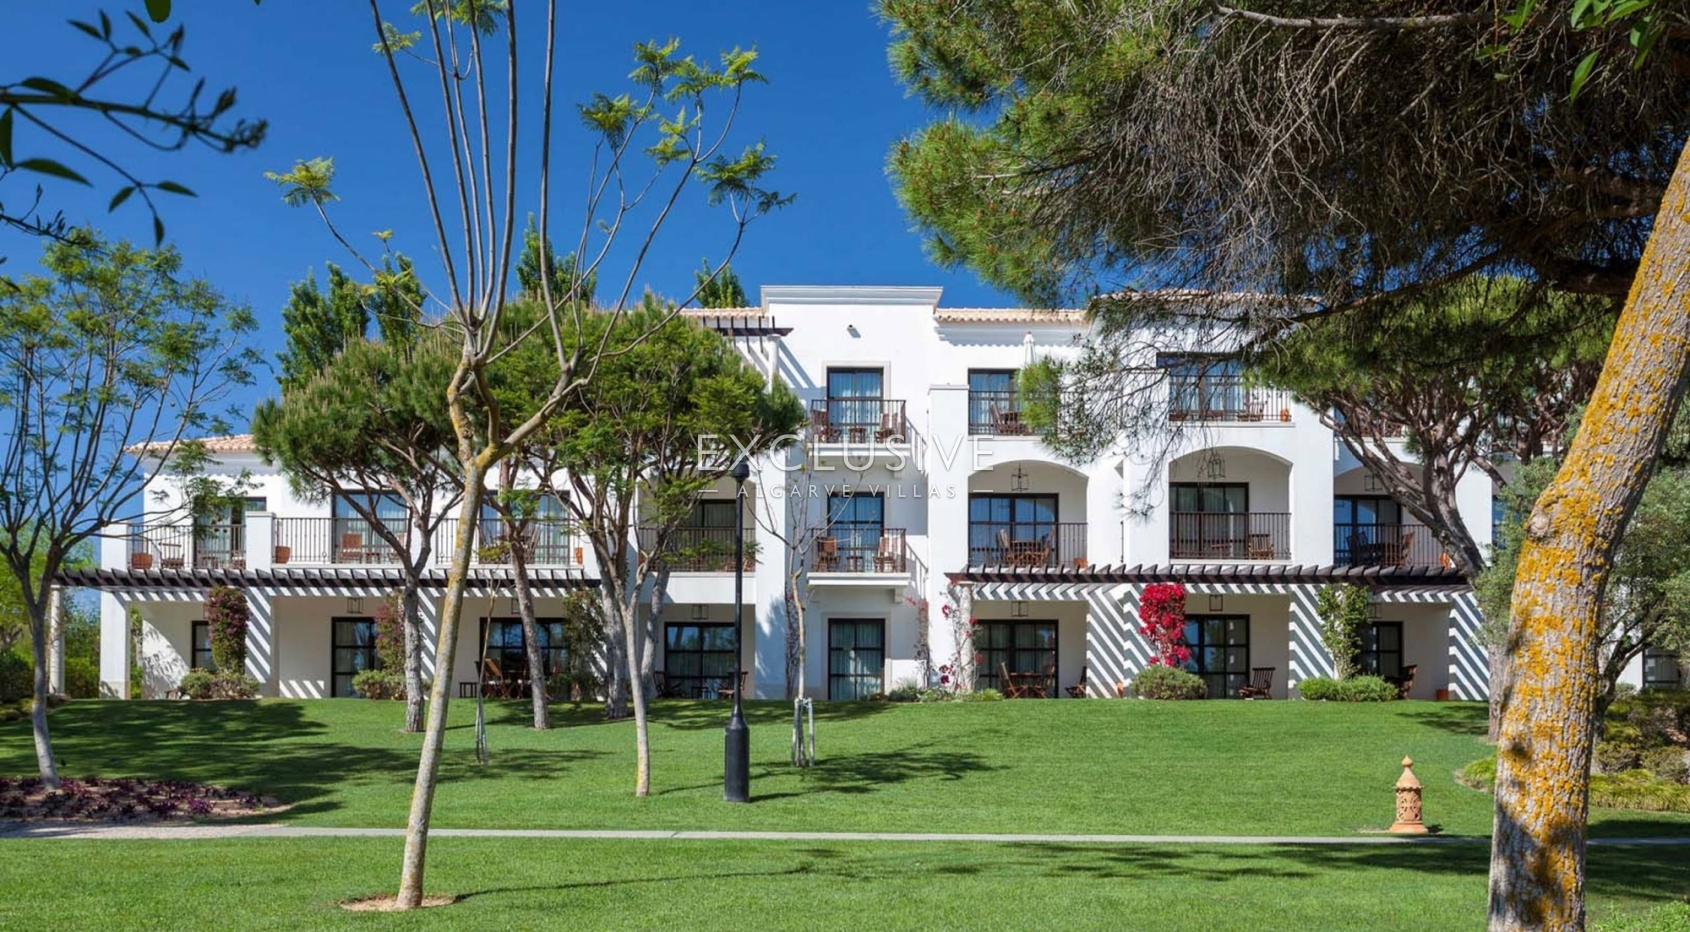 Investimento, apartamentos T3, resort de golfe de luxo, para venda Alb_1